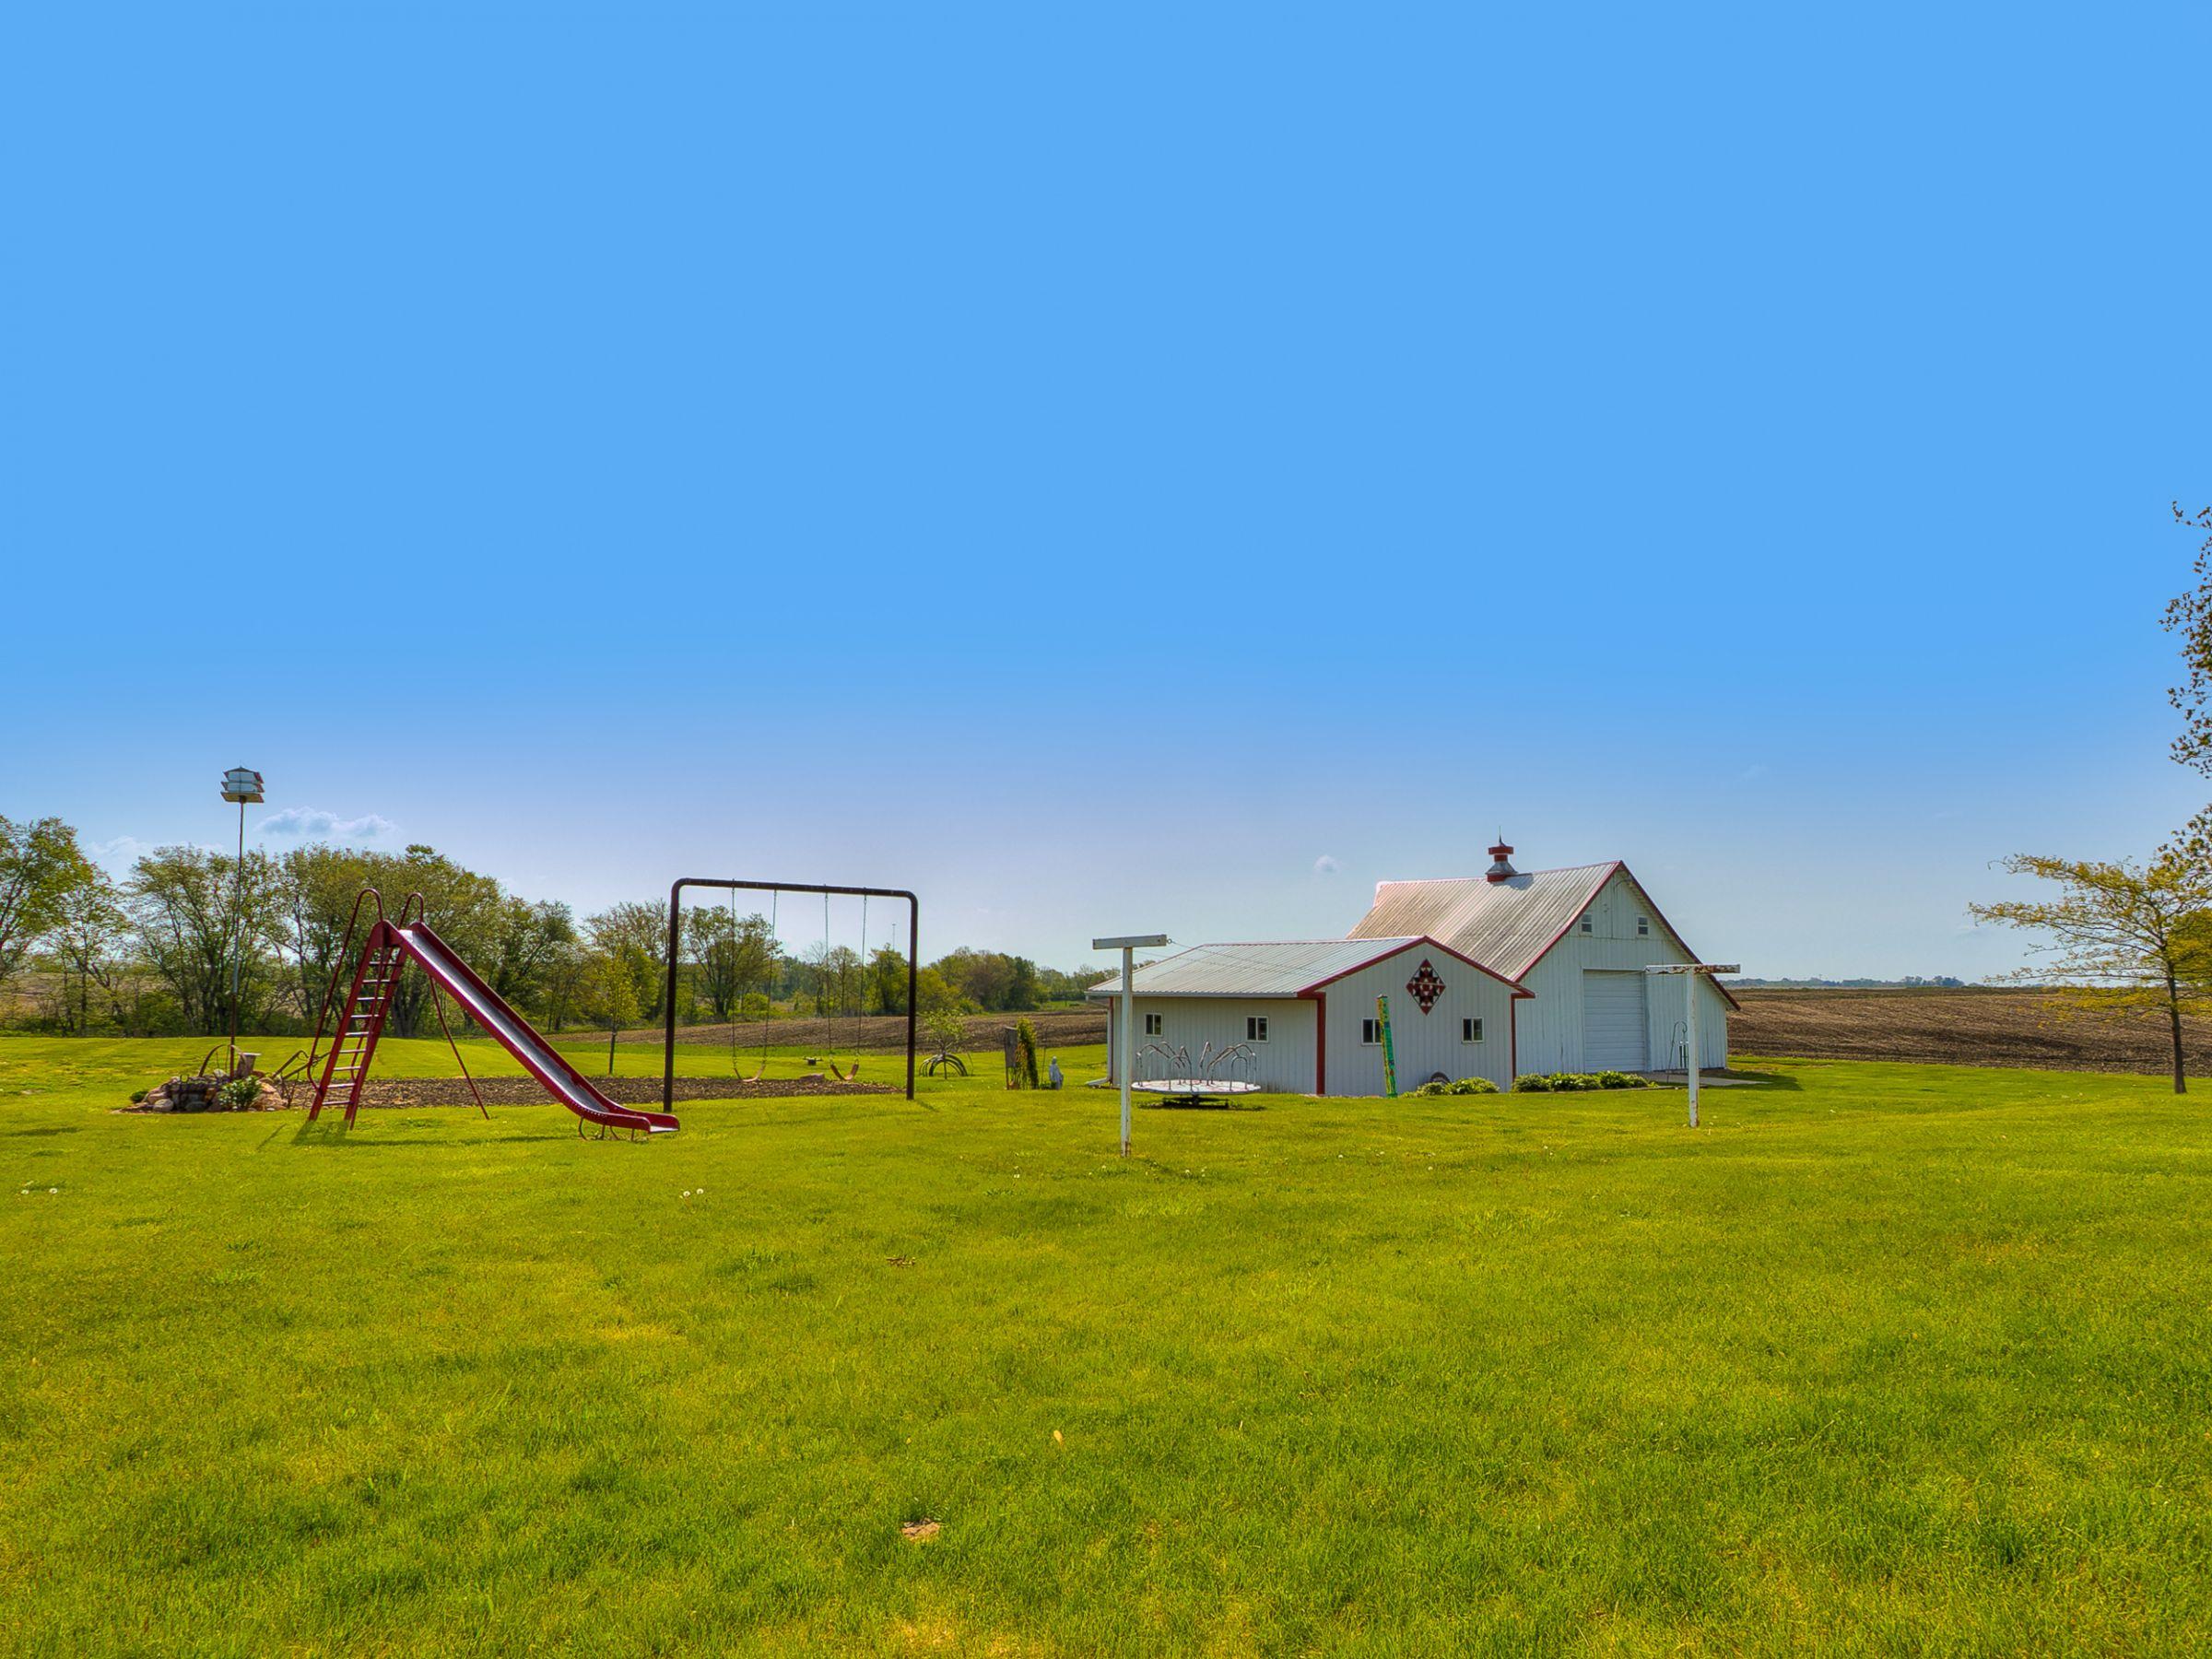 residential-warren-county-iowa-3-acres-listing-number-15516-5-2021-05-12-144751.jpg